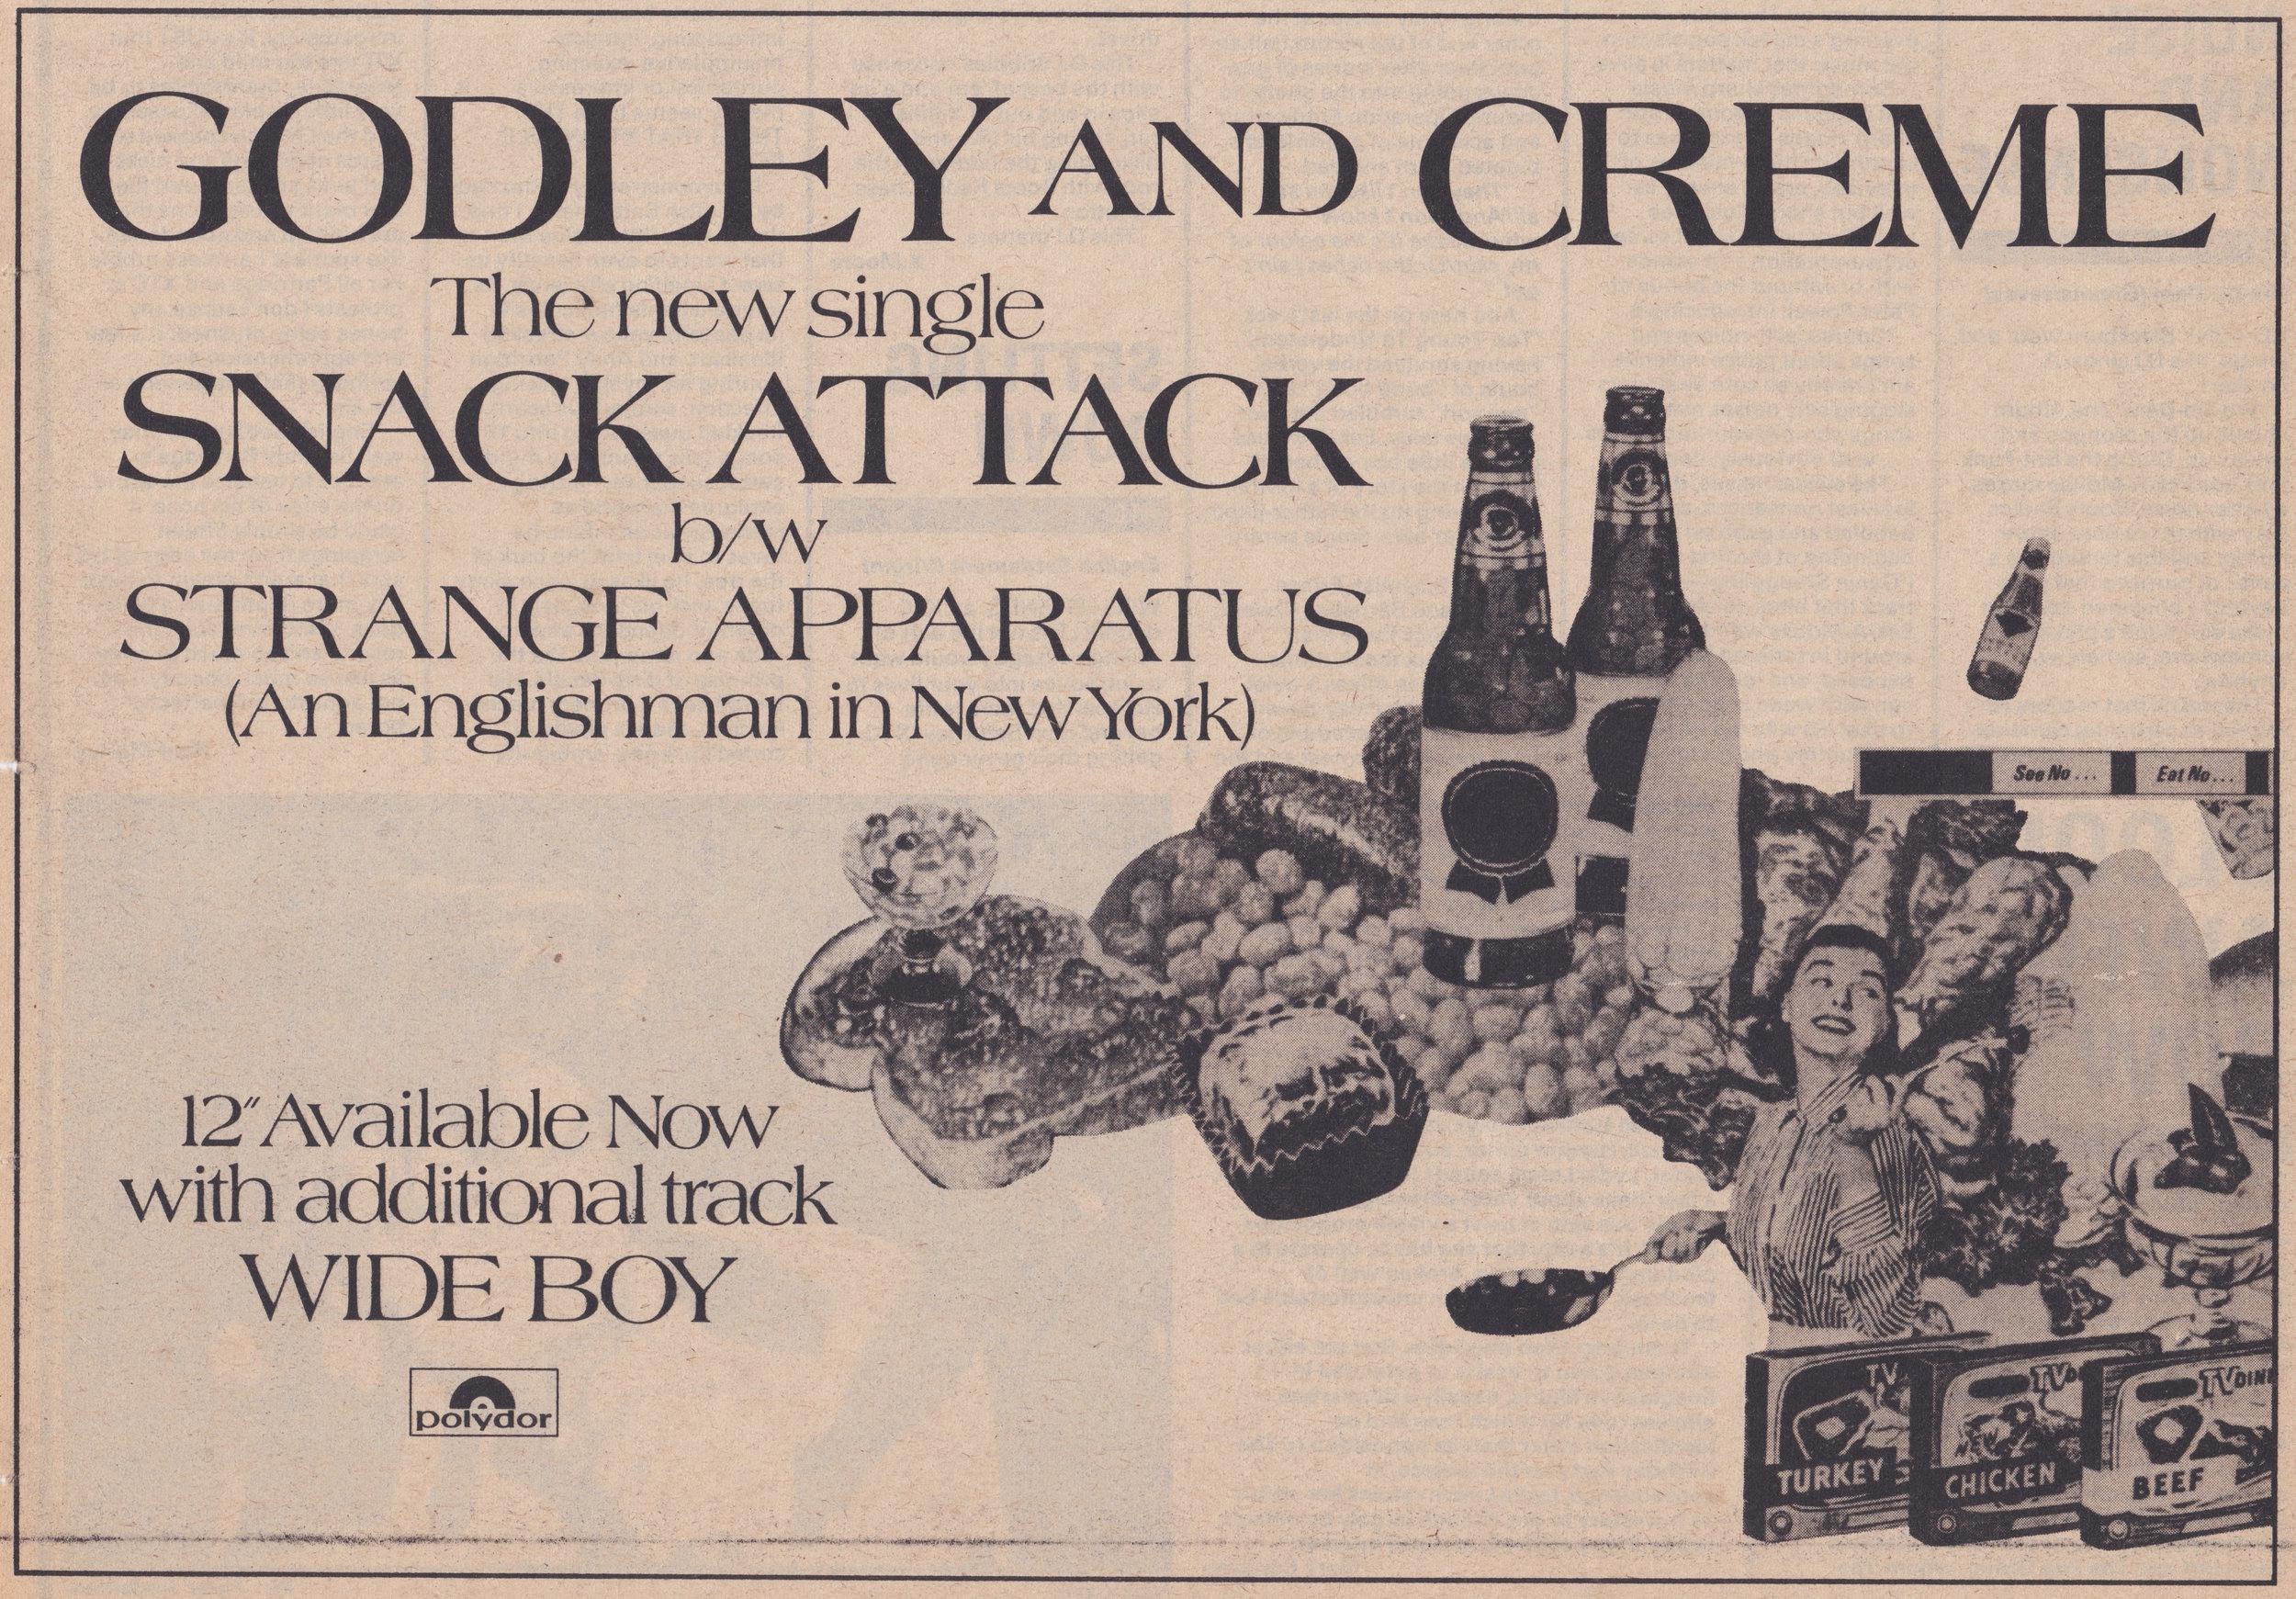 Vintage Godley and Creme newspaper ad